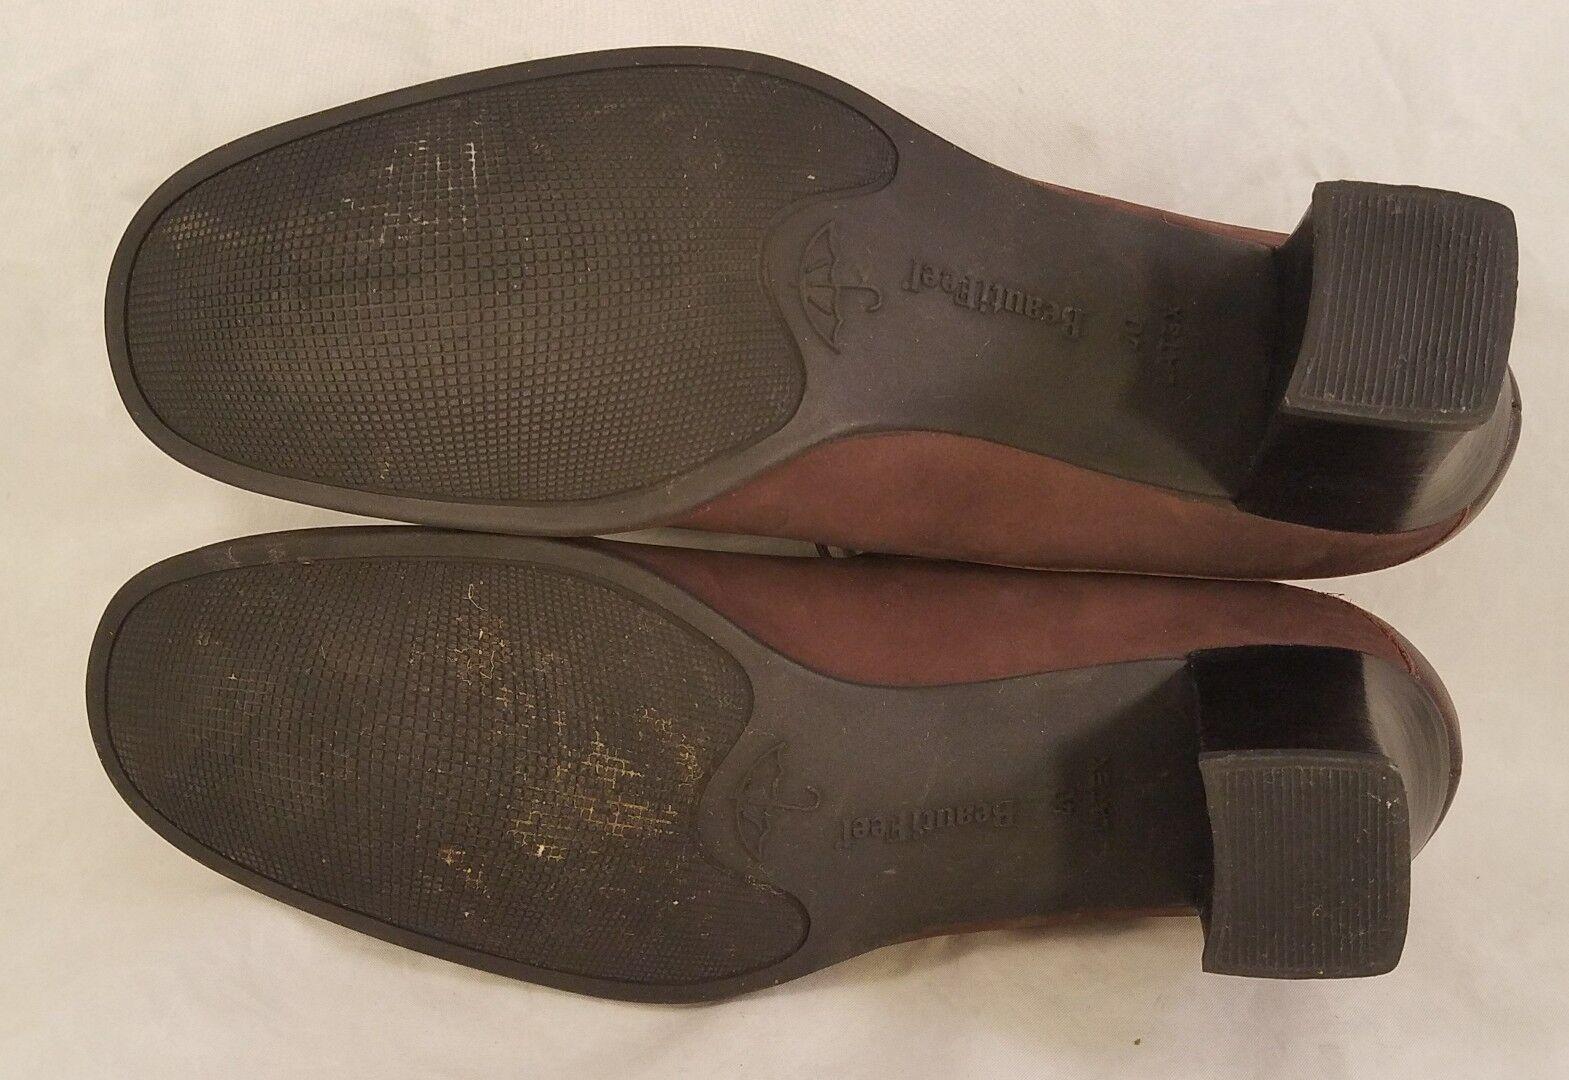 BEAUTIFEEL WOMAN chaussures MARY JANES marron NUBUCK NUBUCK NUBUCK  Taille 40  USA 9 EUC b16bee